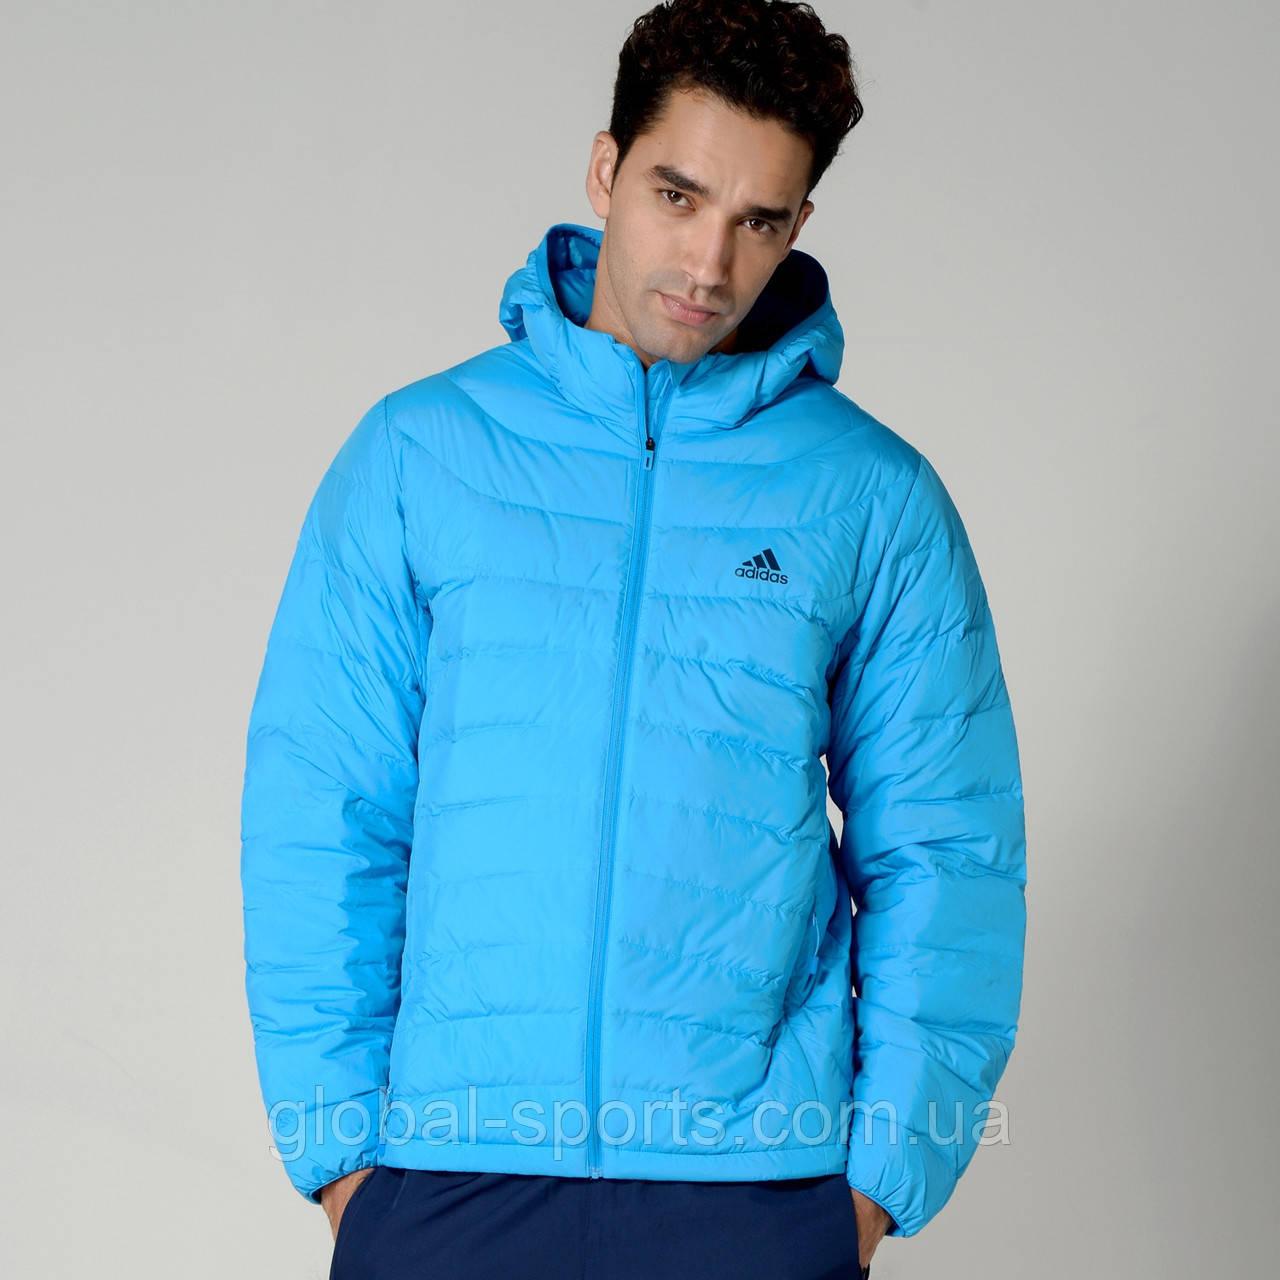 Мужская куртка Adidas DG90 BASIC (Артикул  AB4640) - Global Sport в Харькове 5eb119be3e8